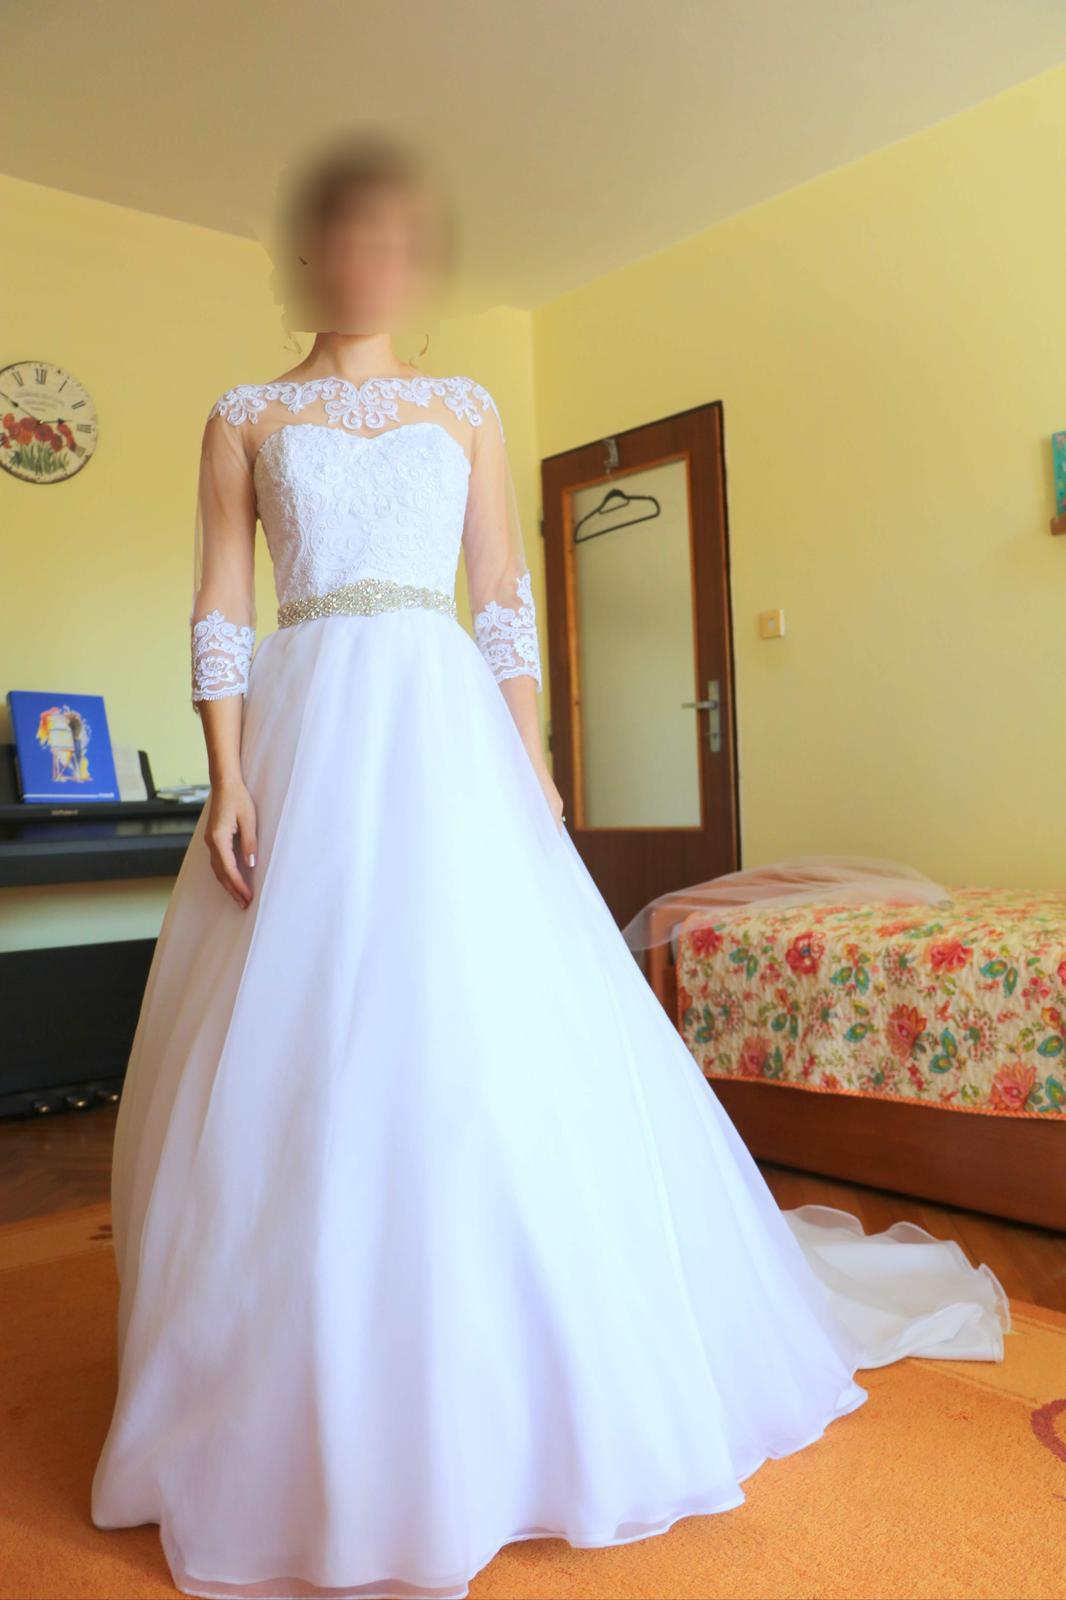 Svadobné šaty pre útle nevesty - Obrázok č. 3